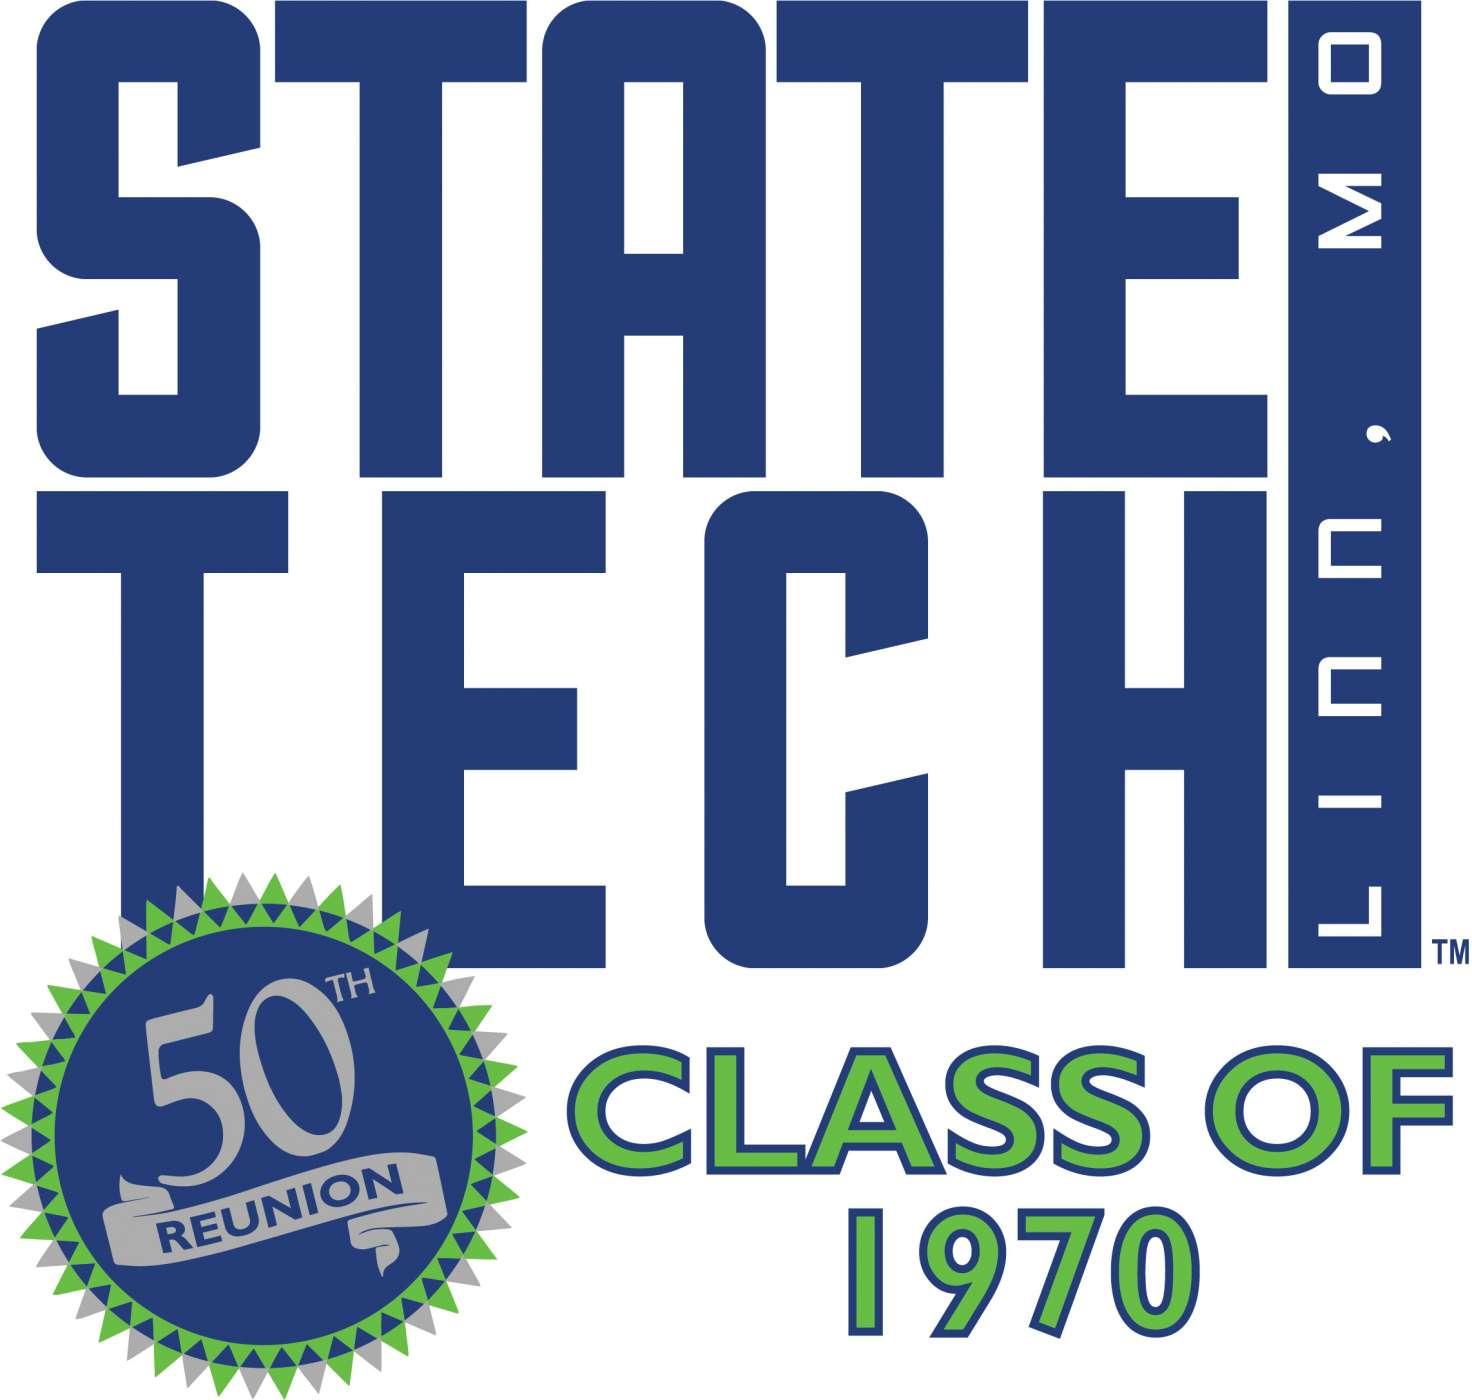 Class of 1970 Logo 50 Years